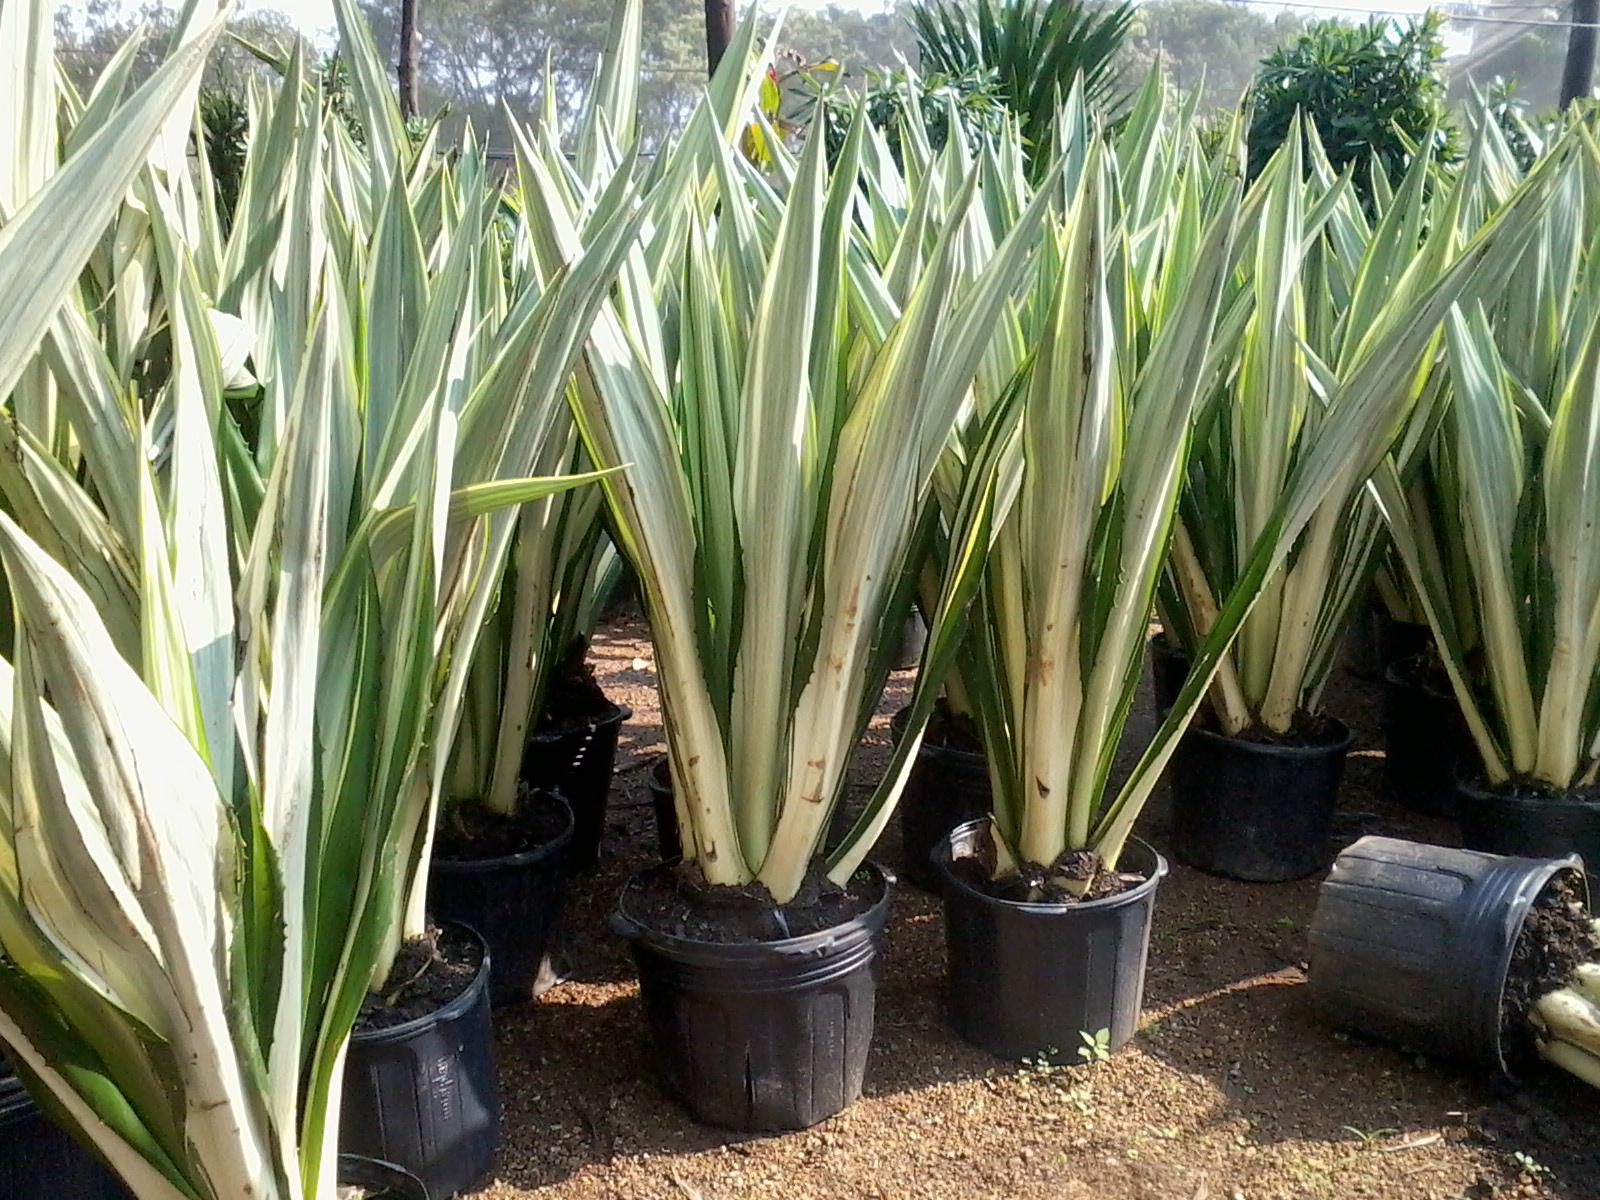 Paisagismo f cil plantas ornamentais de sol for Plantas para pleno sol